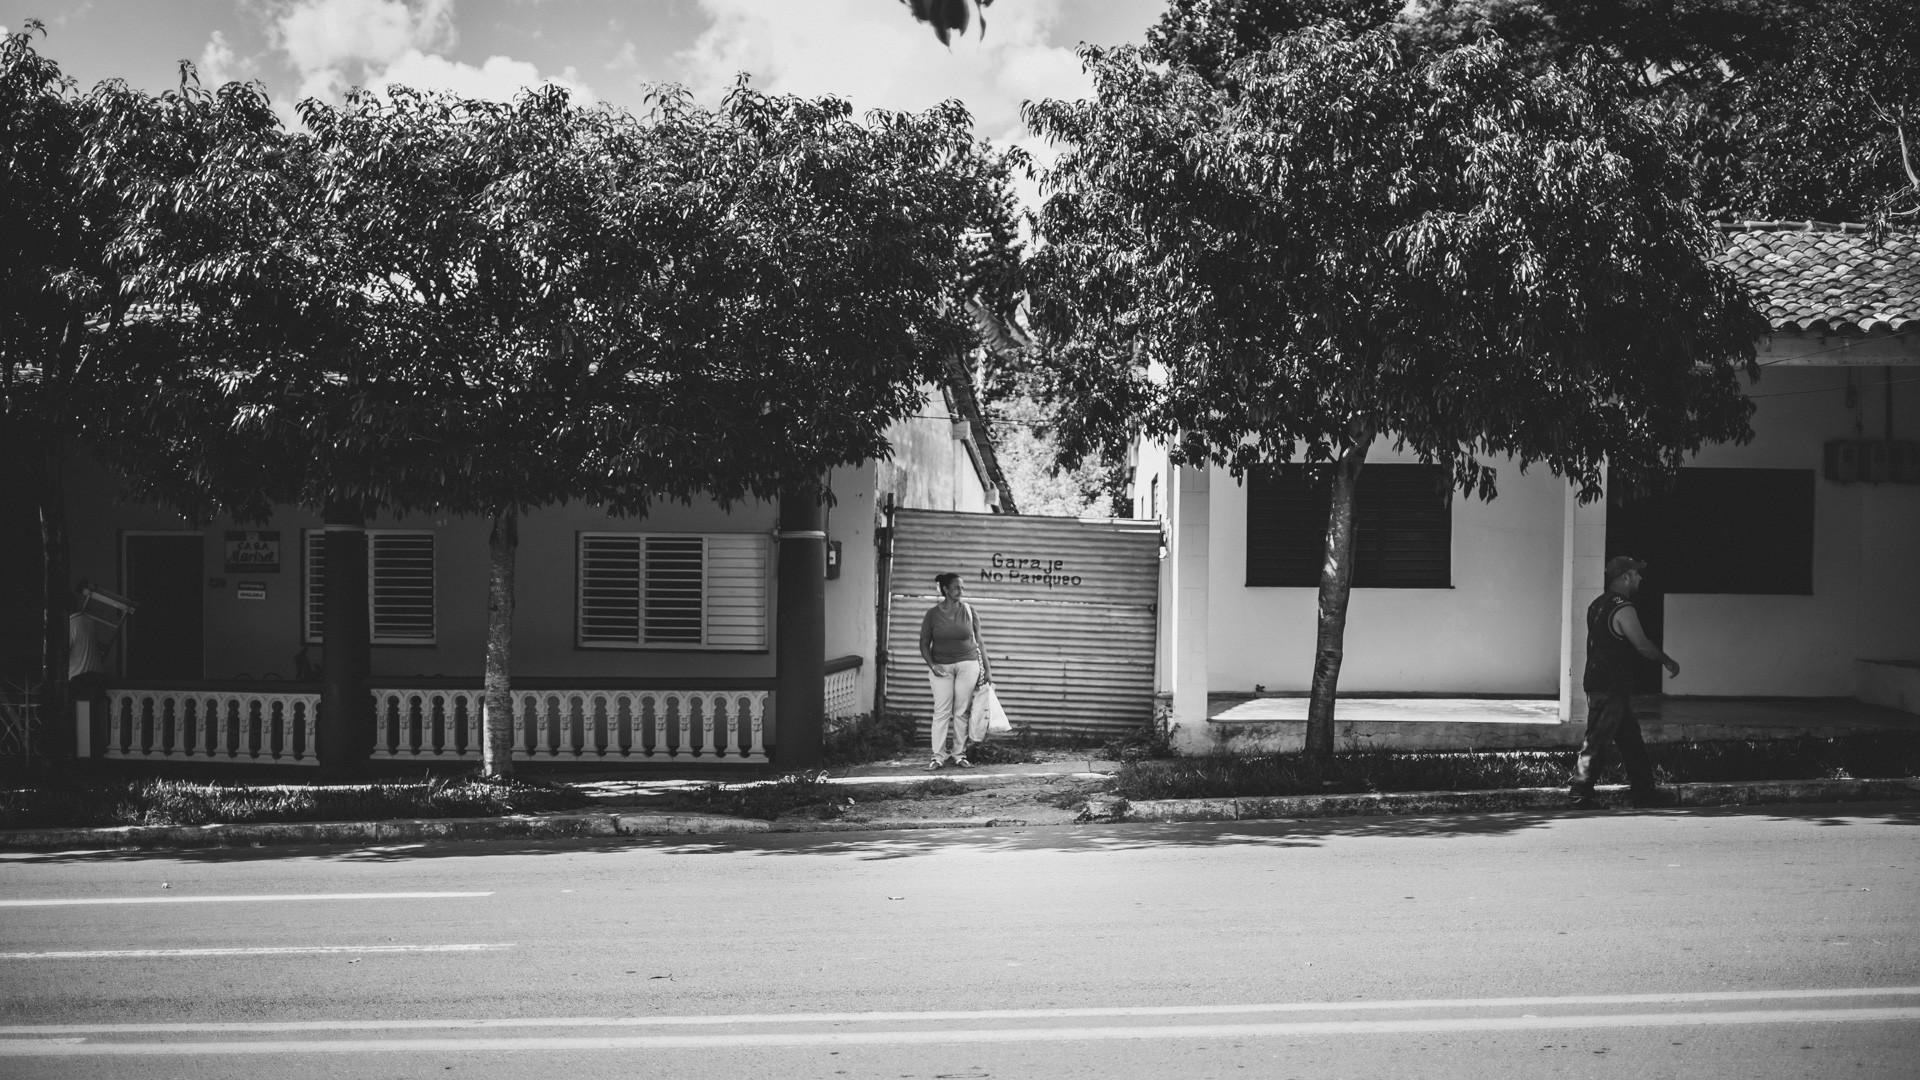 Damien-Dohmen-Photographe-Cuba-15